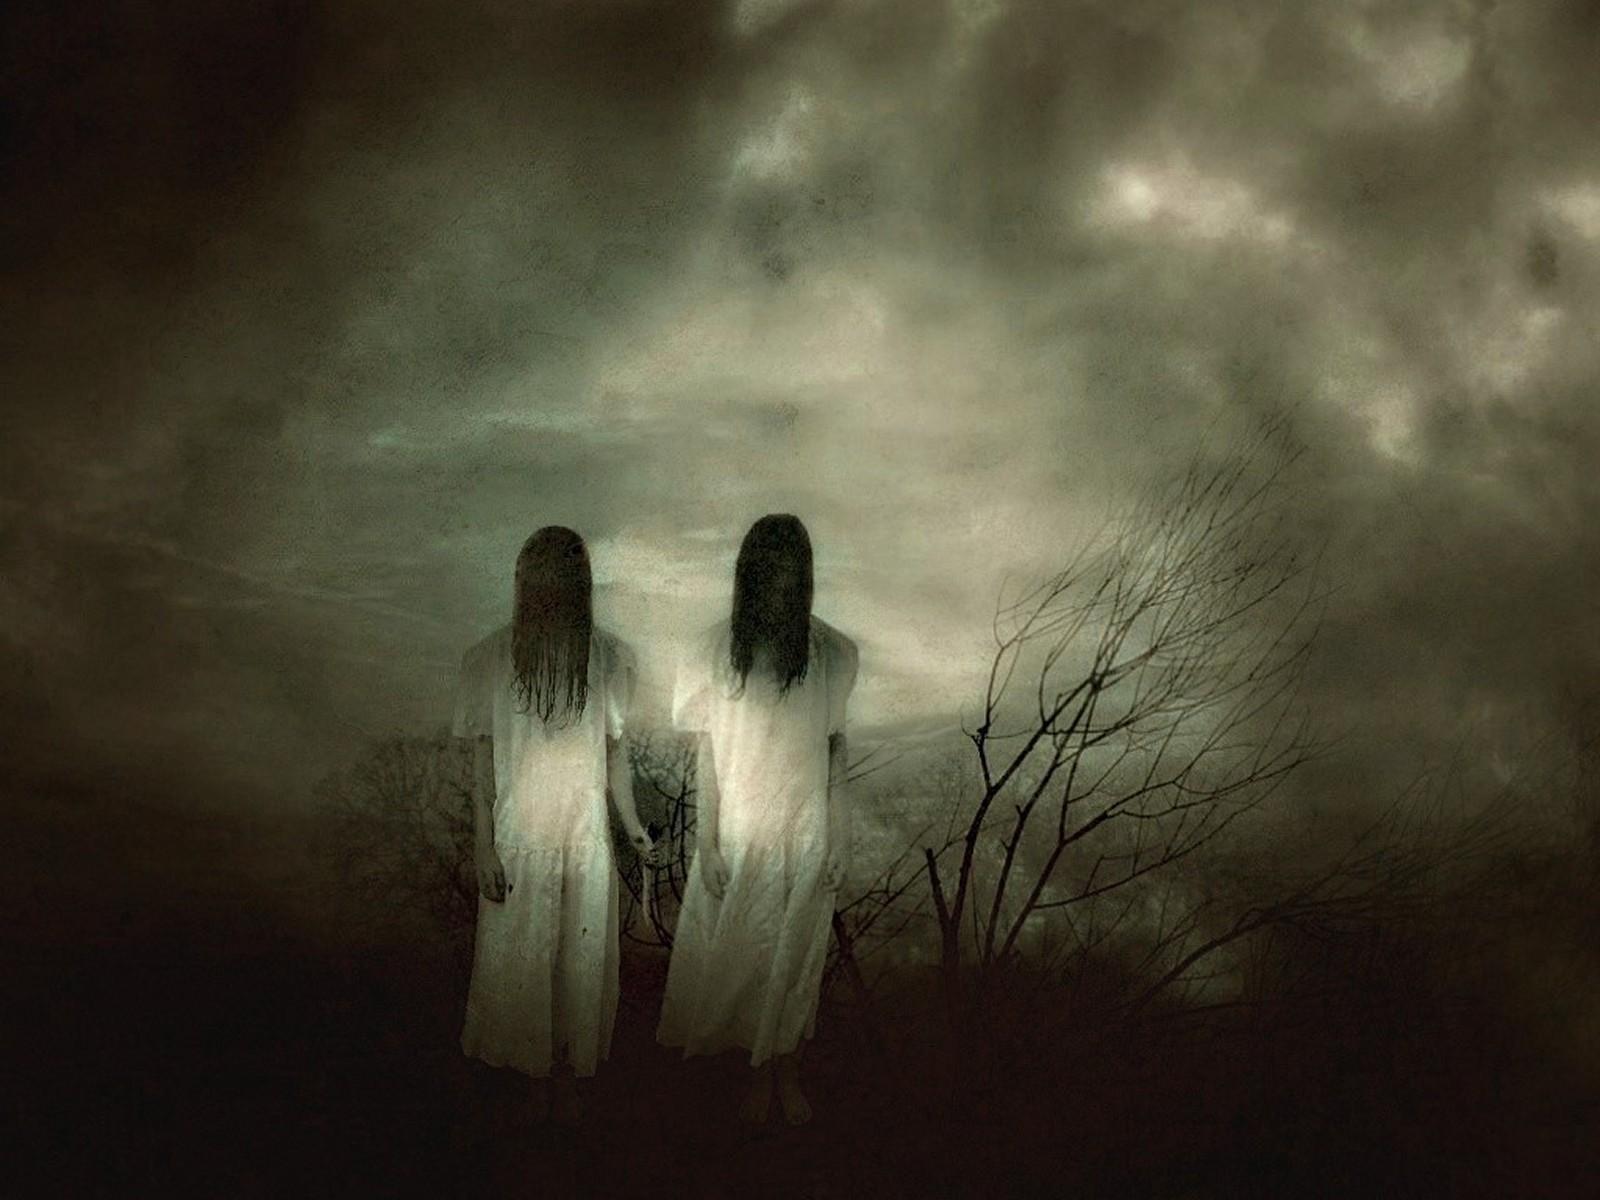 Horror Demons Wallpaper HD Wallpapers 1600x1200